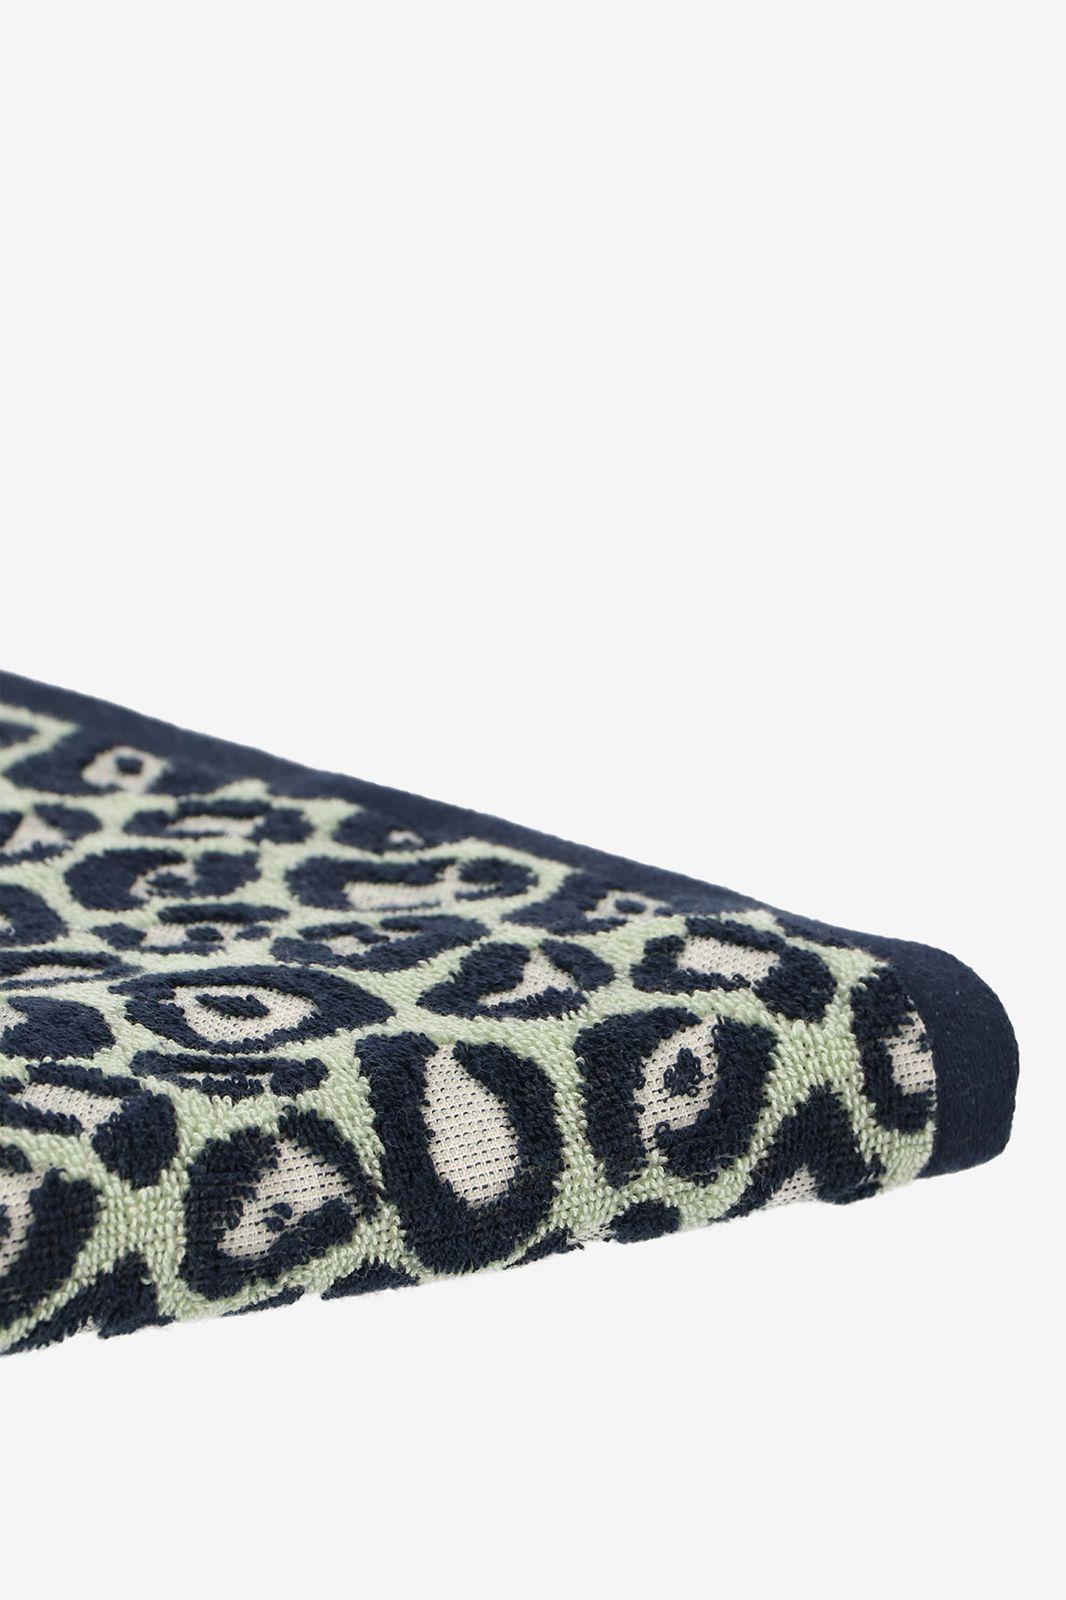 Handdoek lichtgroen met panter print - Homeland | Sissy-Boy